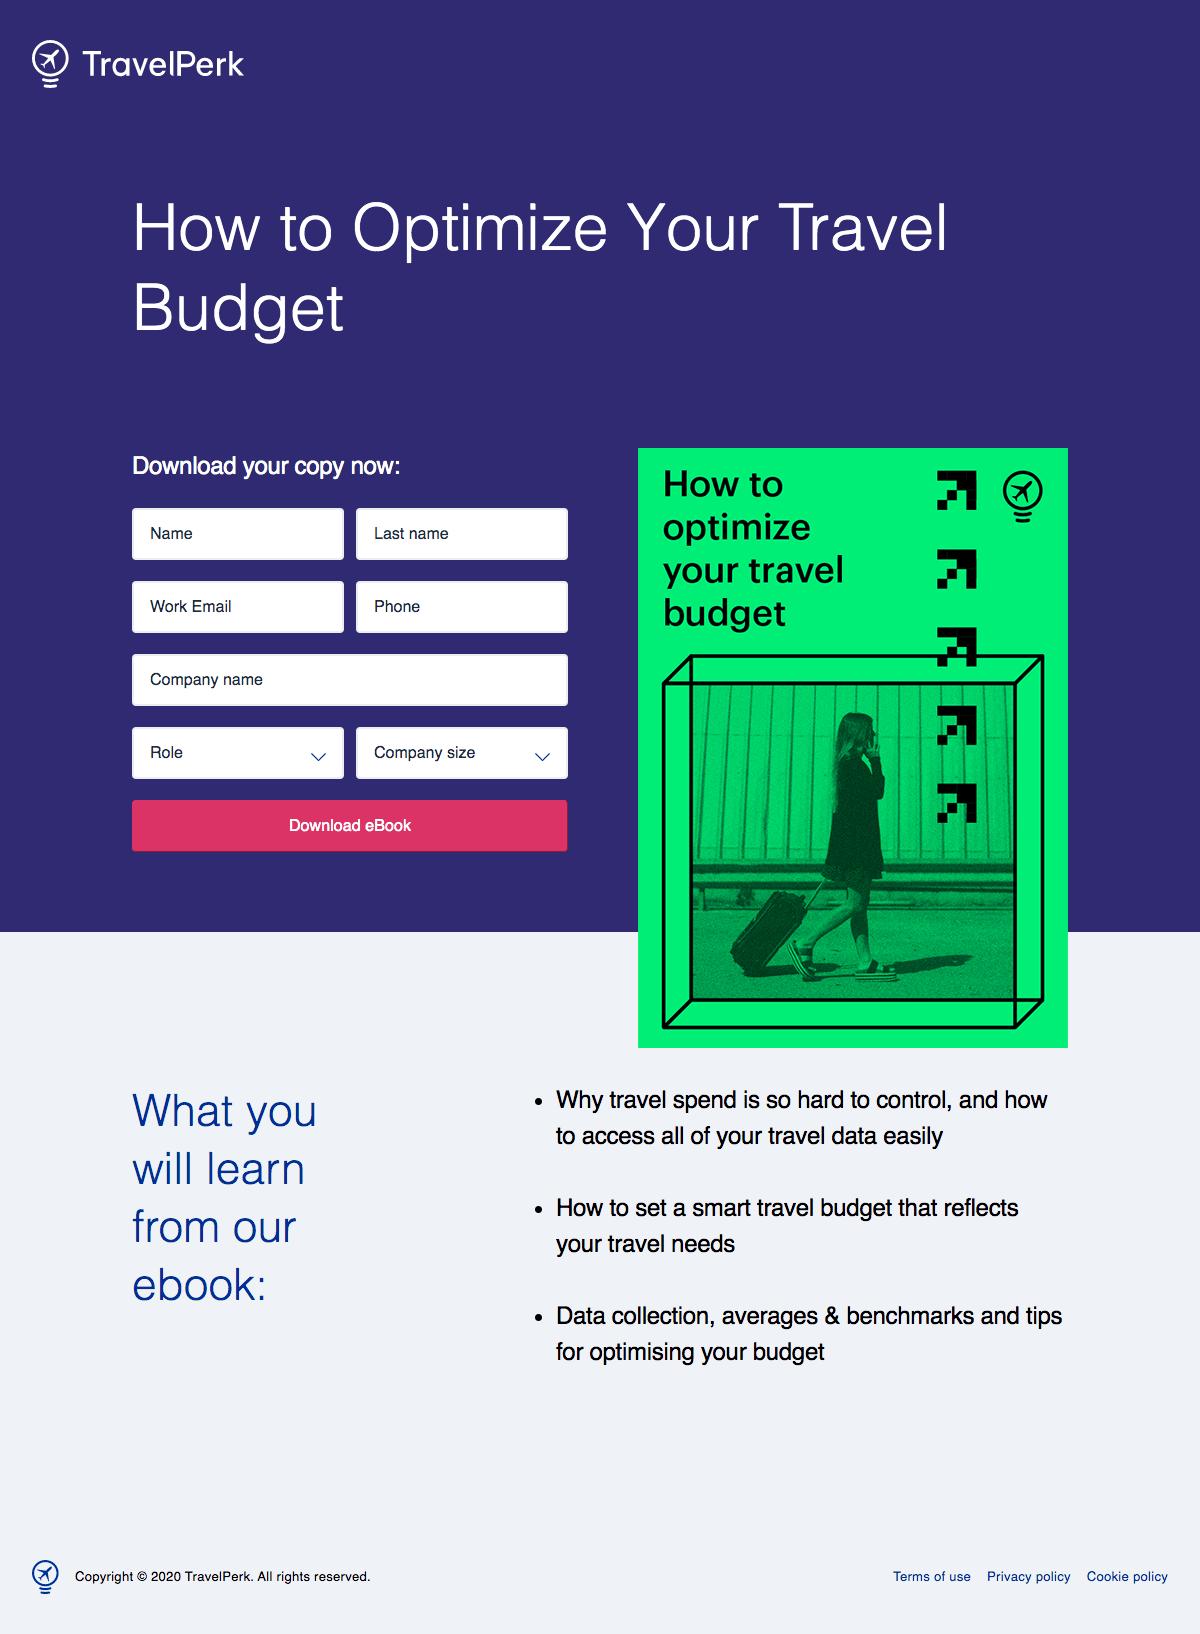 TravelPerk – Resources page 2